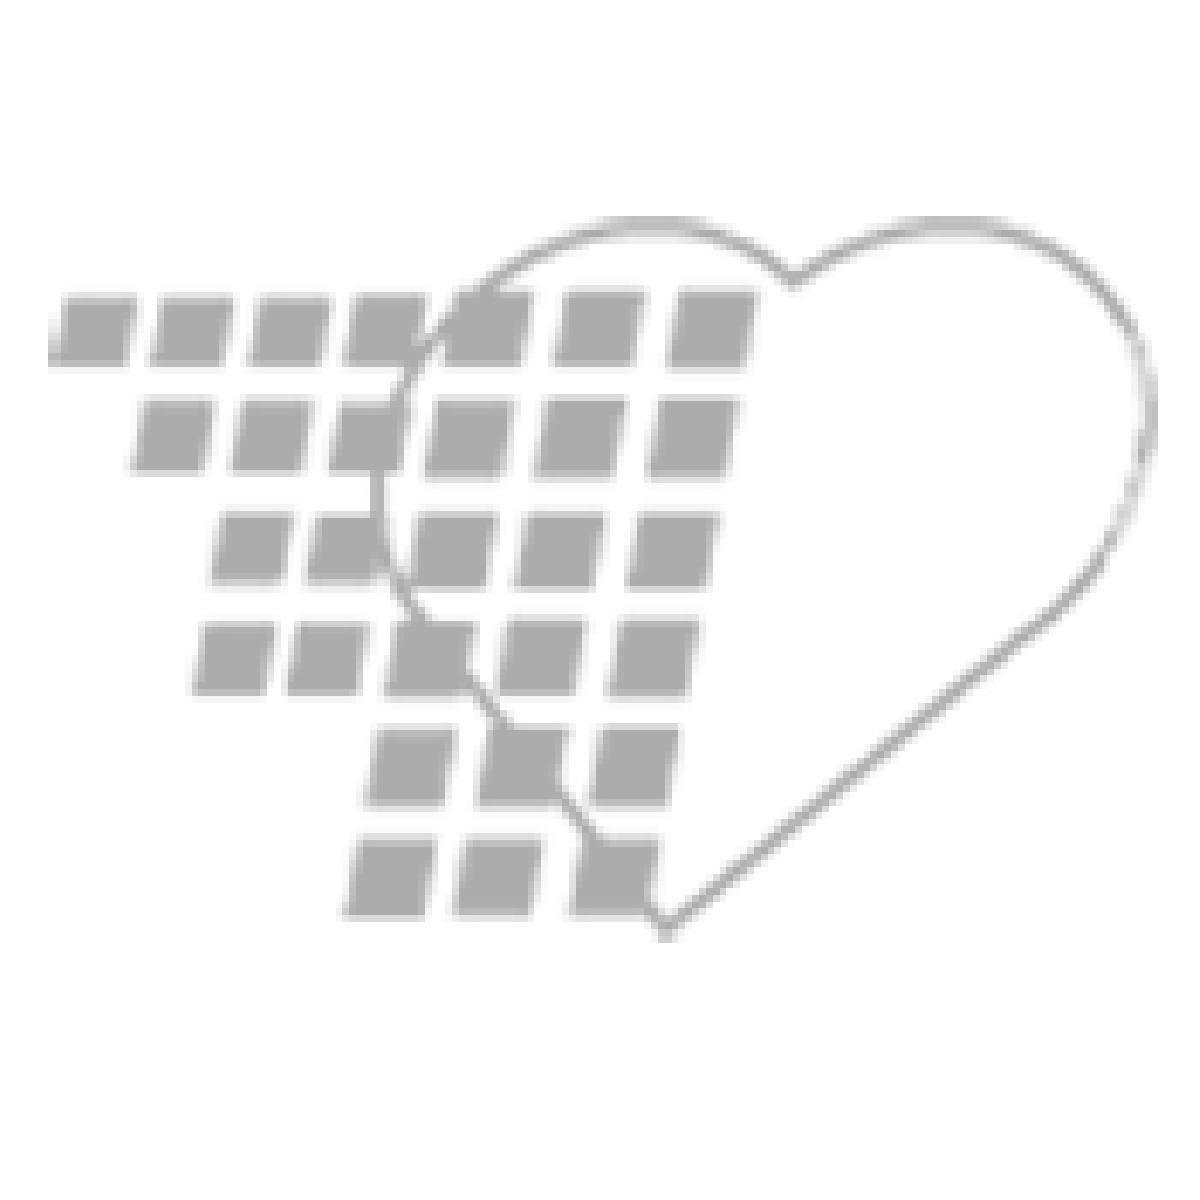 06-93-0086 - Demo Dose® Lisinoprl 10 mg - 1000 Pills/Jar